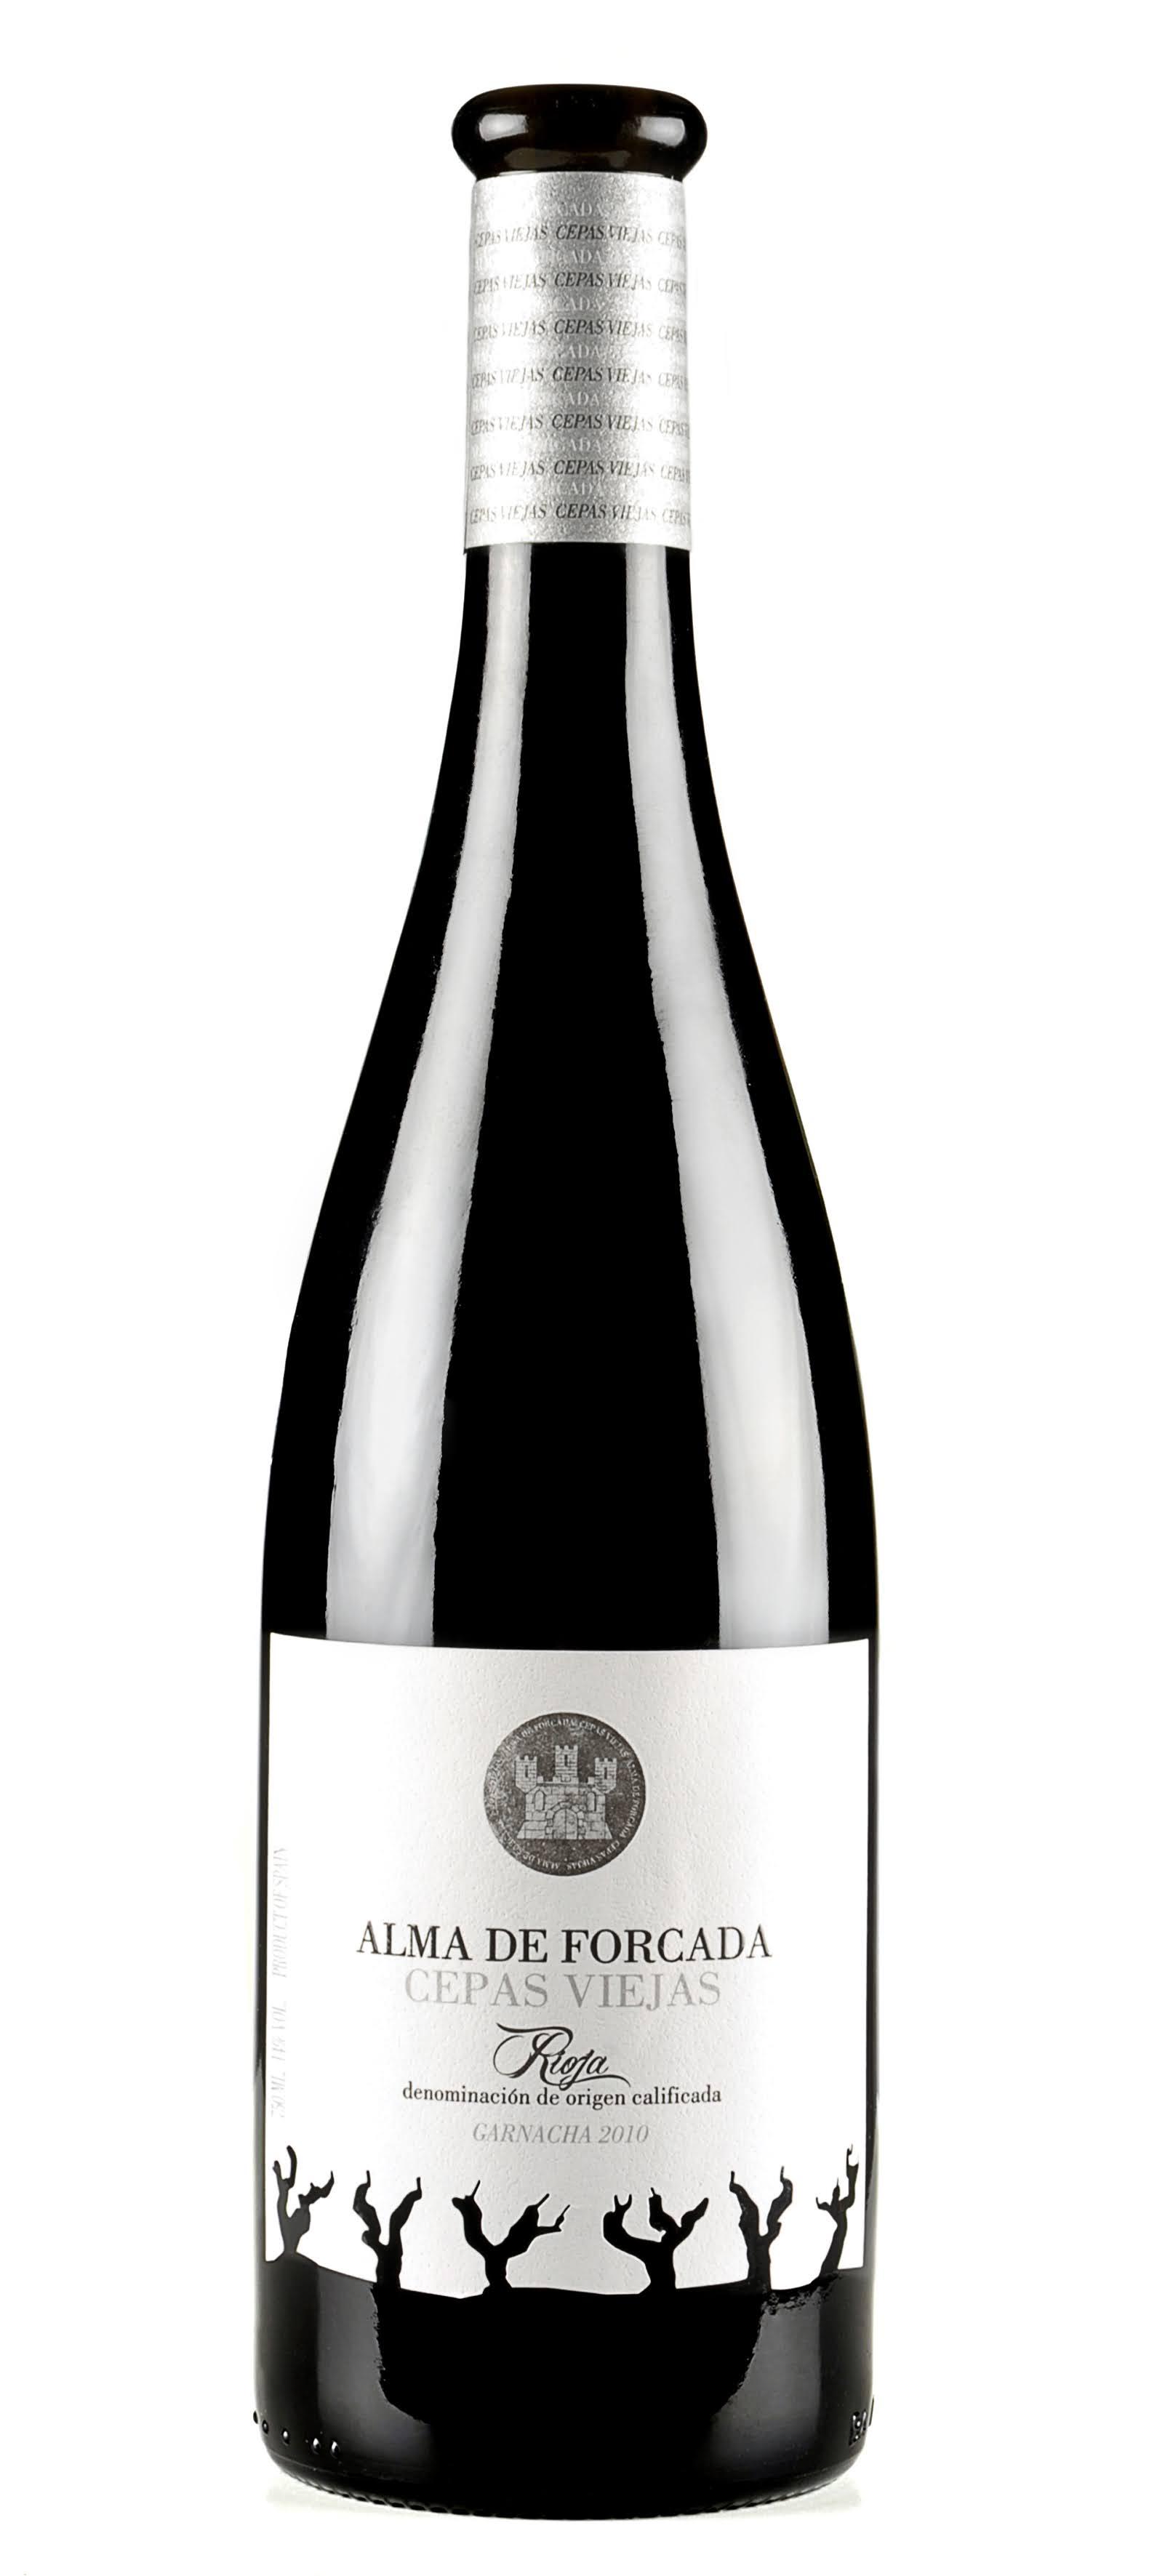 Bodegas Forcada Rioja Garnacha Cepas Viejas